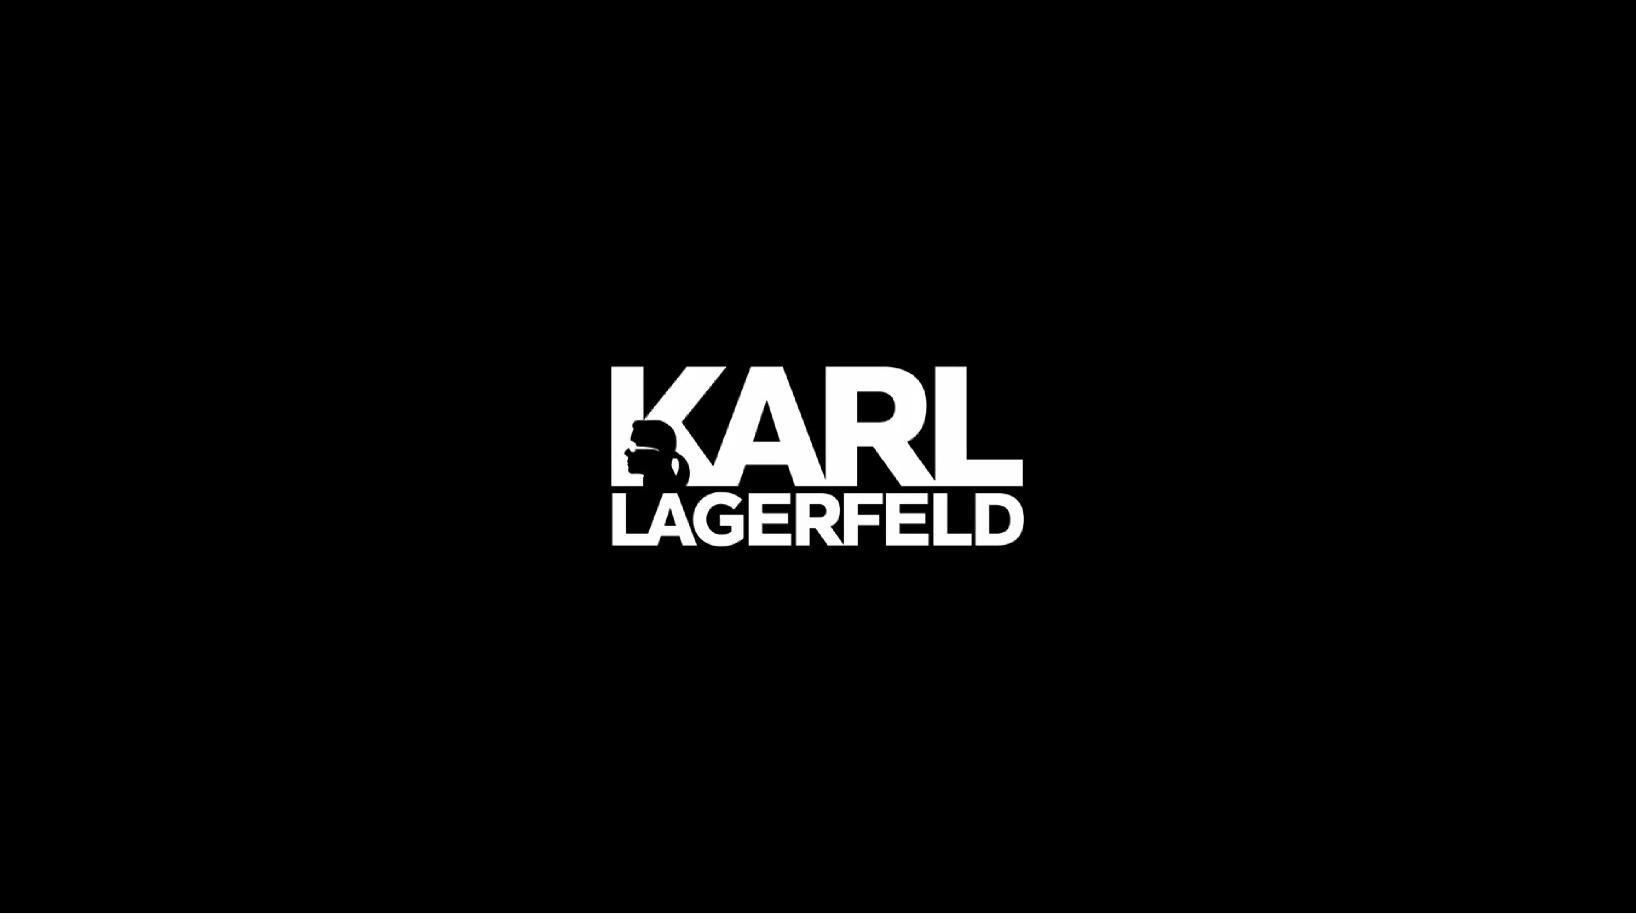 KARL LAGERFELD FW16